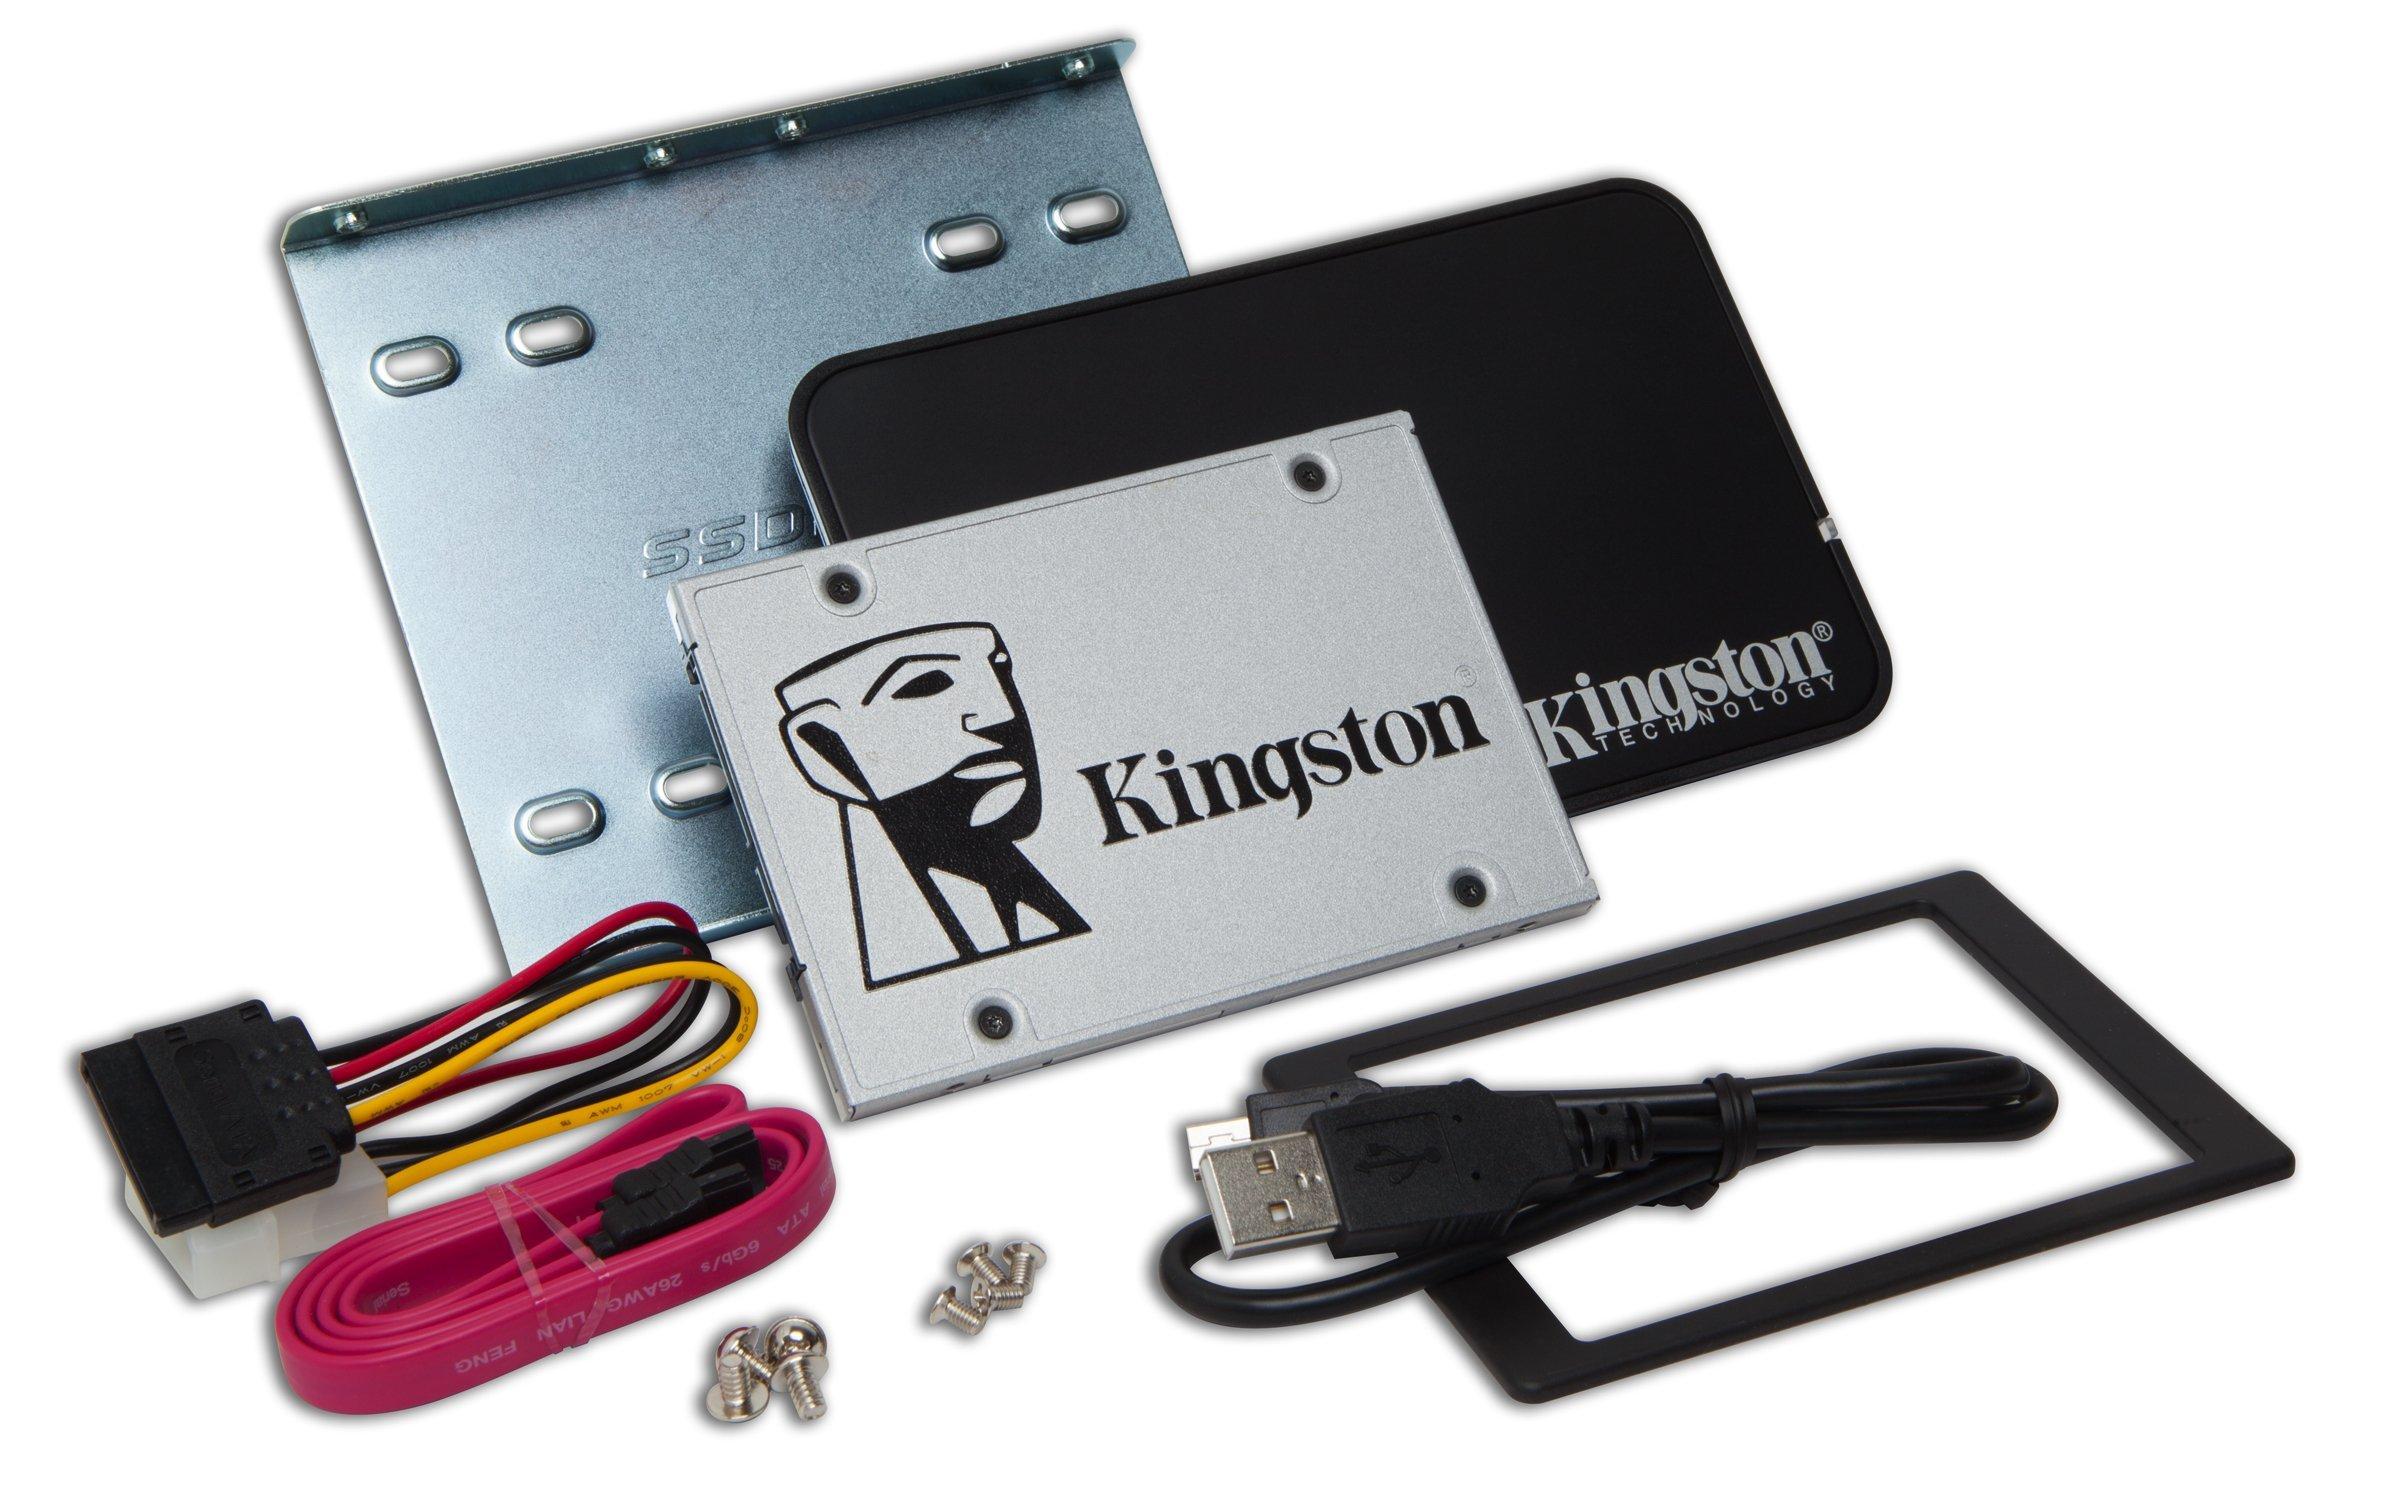 Kingston Digital 240GB SSDNow UV400 SATA 3 2.5'' Solid State Drive with Bundle Kit SUV400S3B7A/240G by Kingston